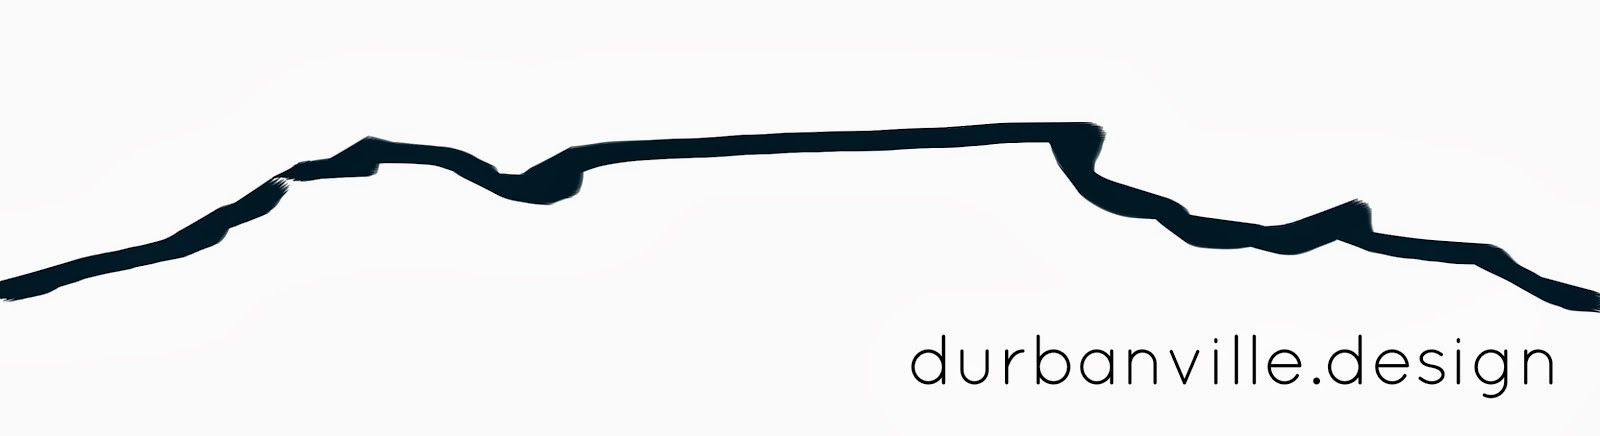 durbanville.design